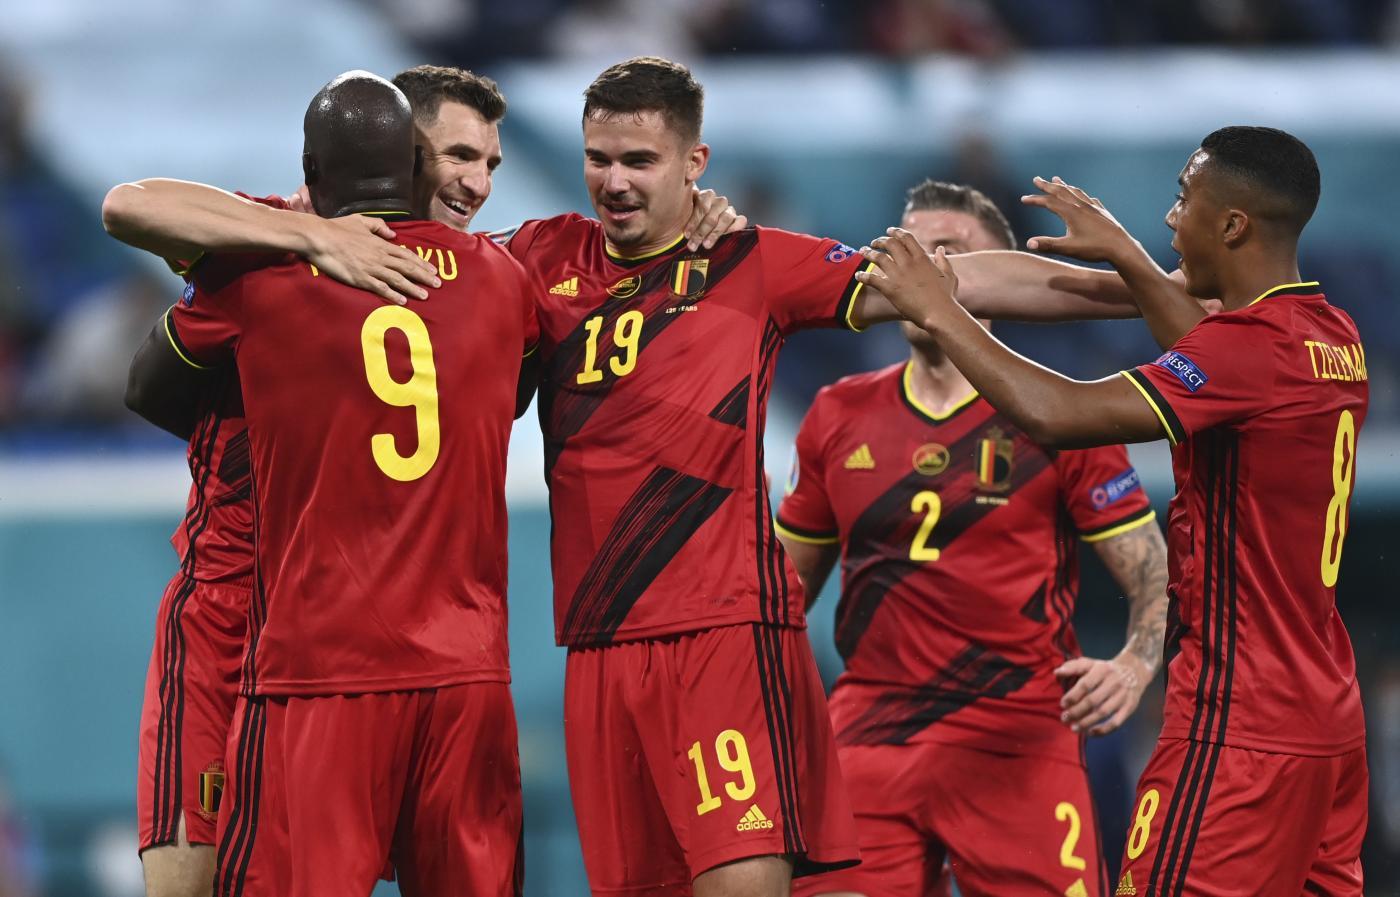 LIVE Finlandia Belgio 0 0, Europei 2021 in DIRETTA: Eden Hazard parte titolare!